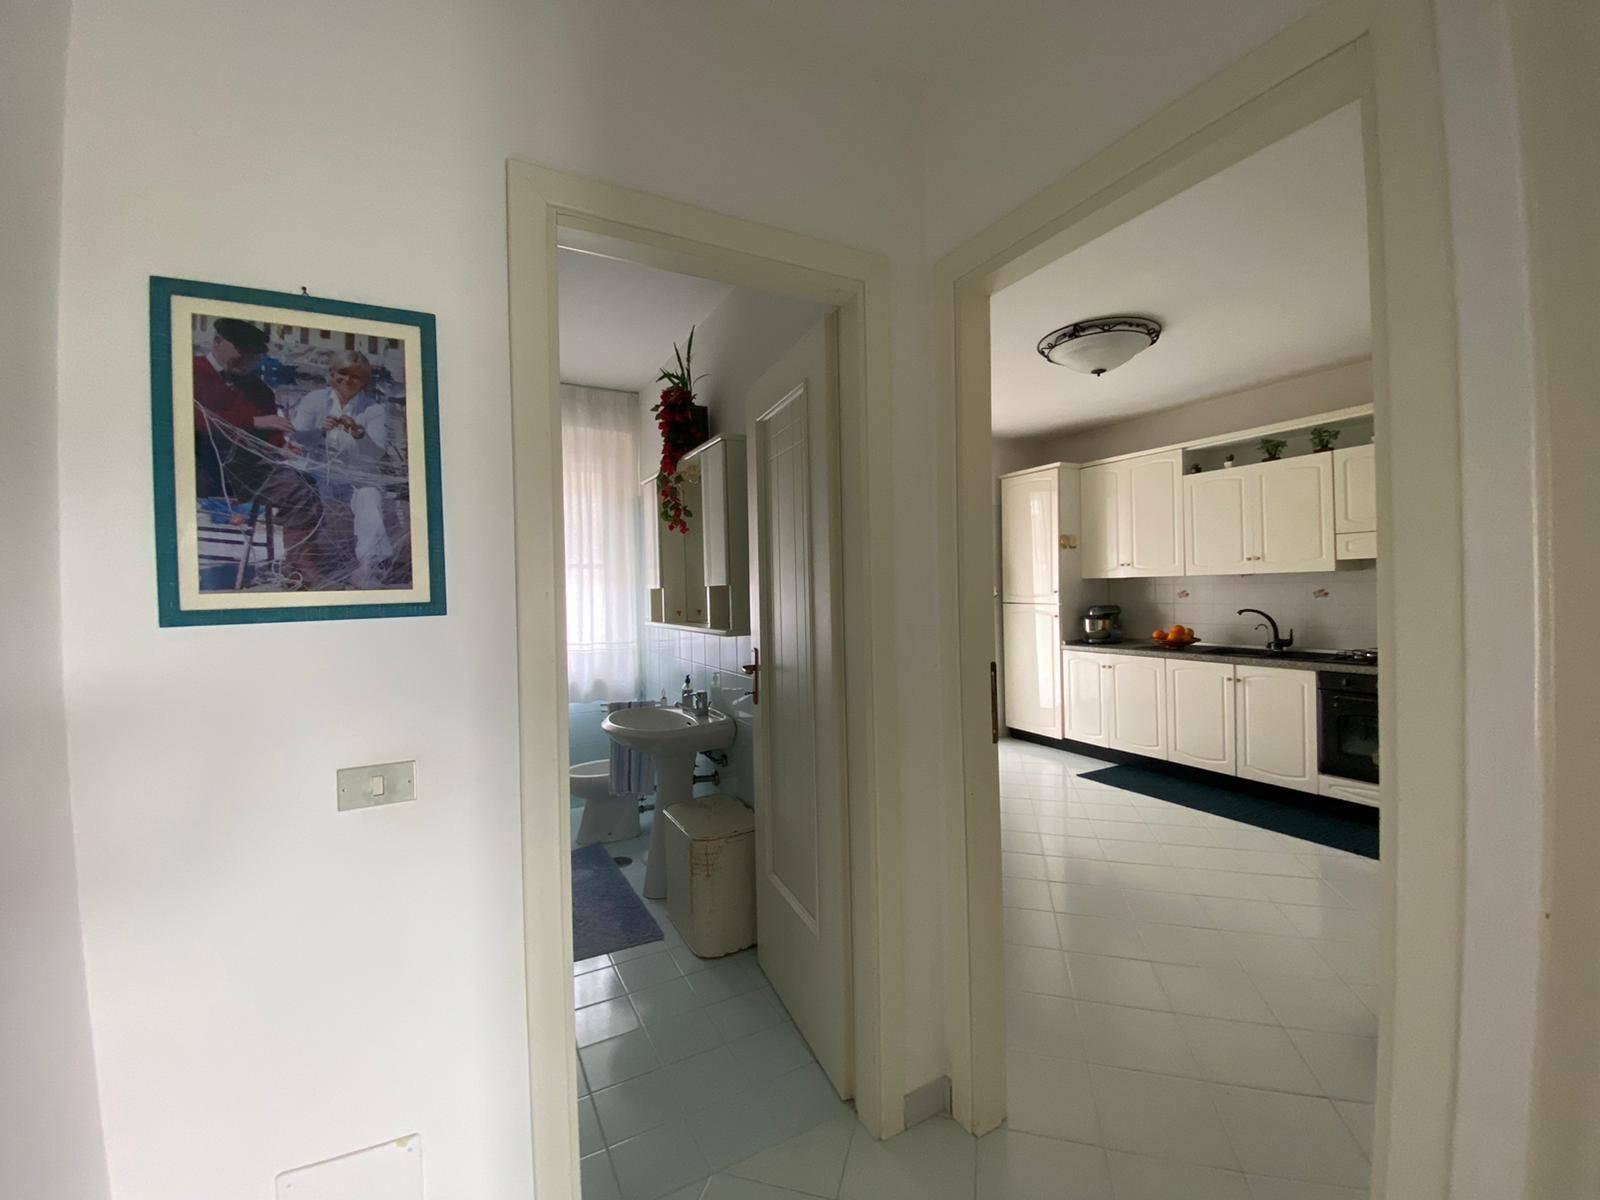 ingresso cucina e bagno